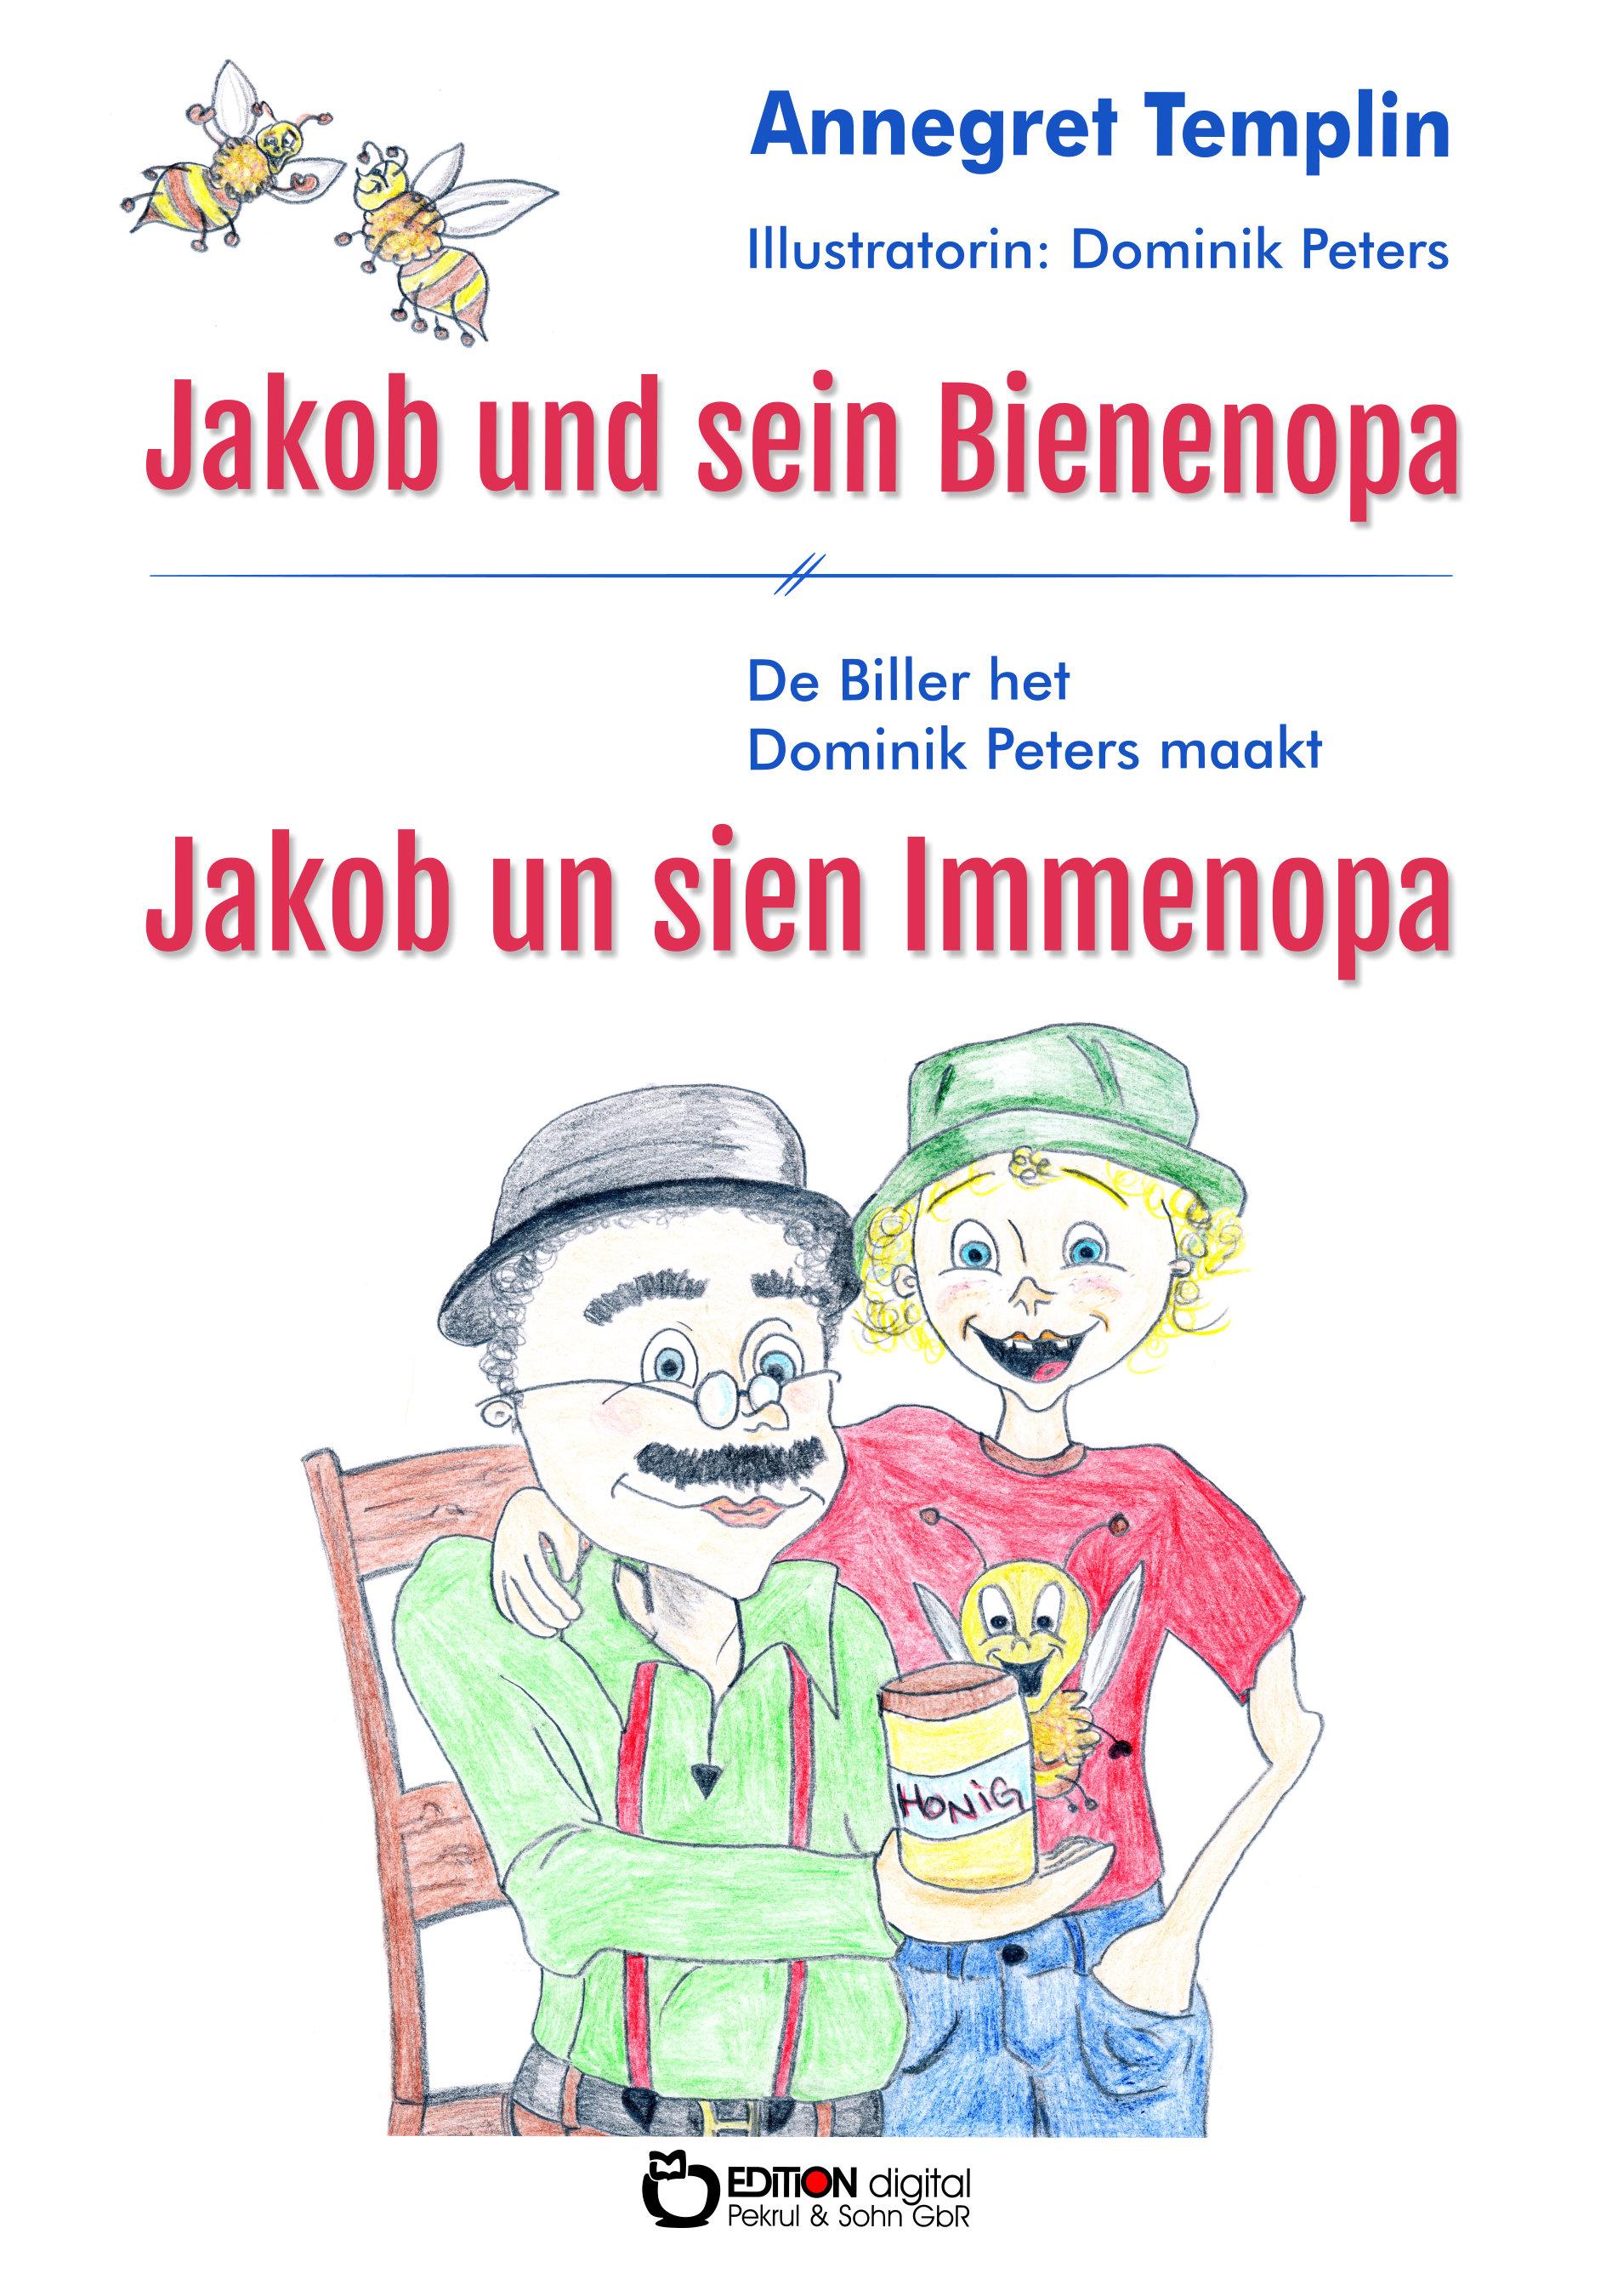 Jakob und sein Bienenopa. Jakob un sien Immenopa von Annegret Templin, Dominik Peters (Illustrator)